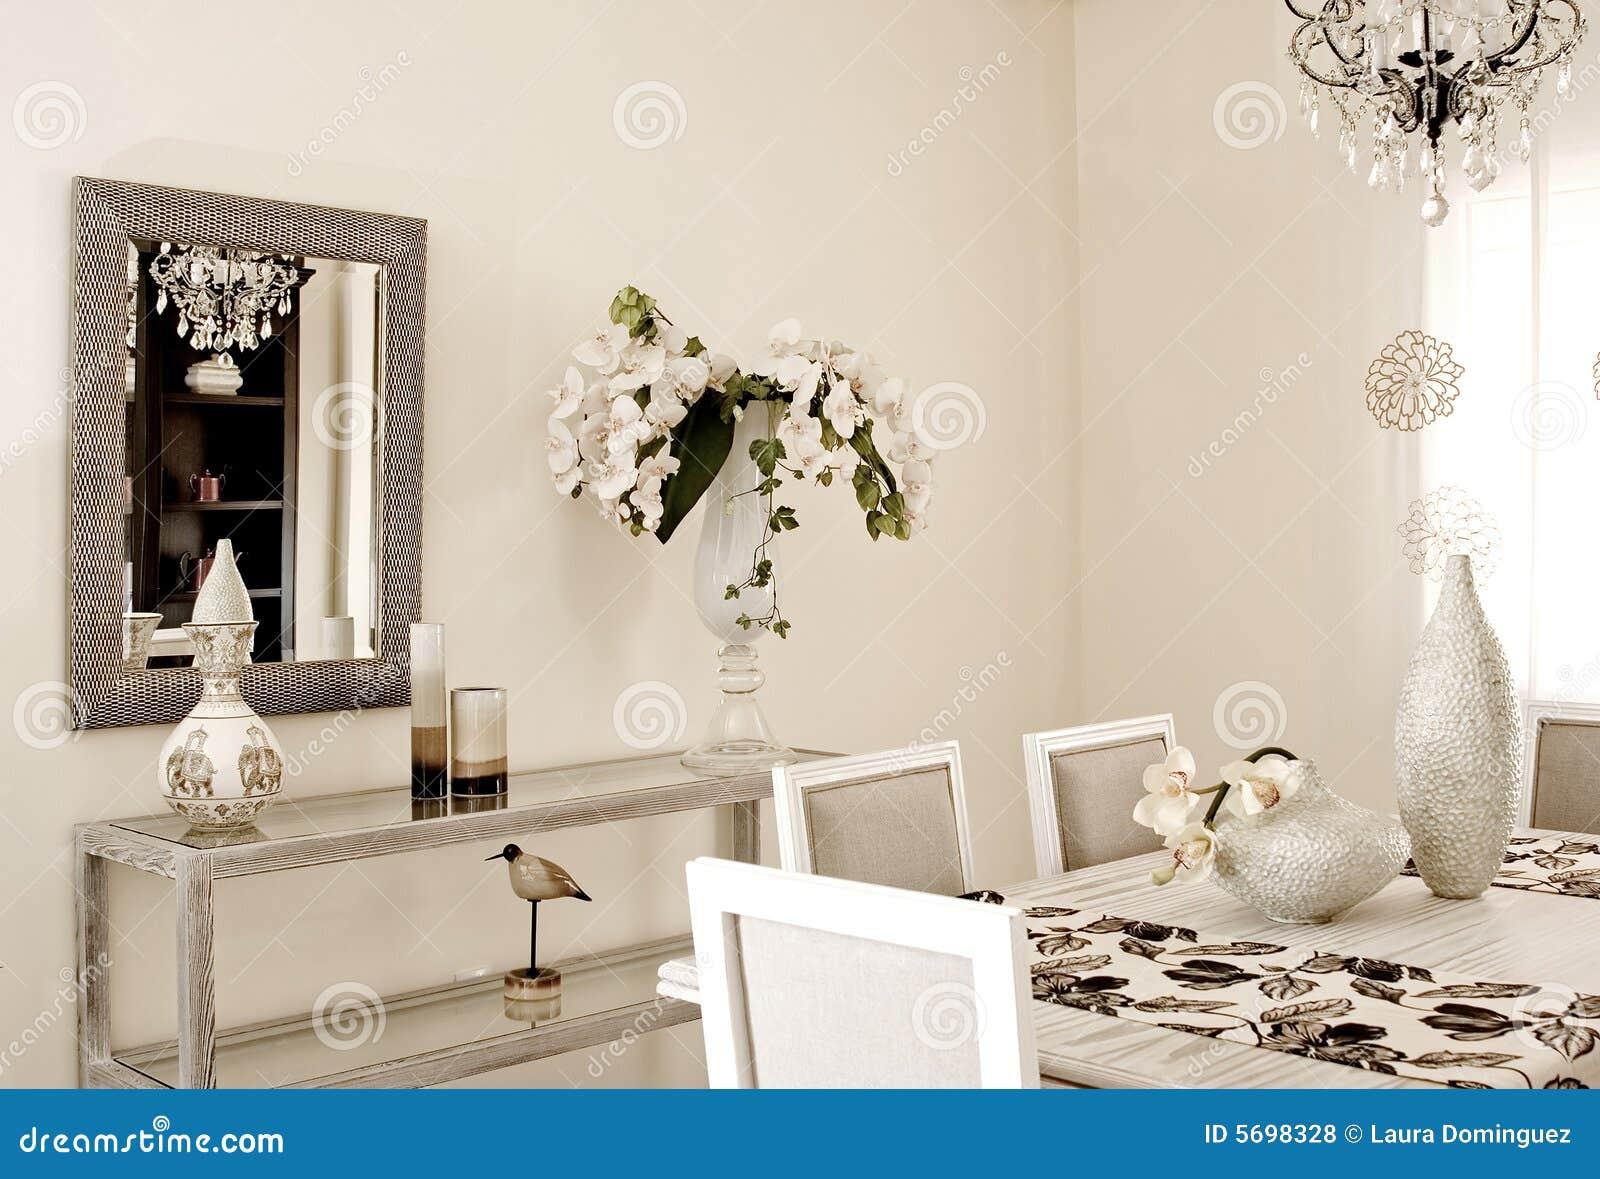 Sala Da Pranzo Classica E Moderna Di Colore Bianco. #84A922 1300 975 Sala Da Pranzo Classica